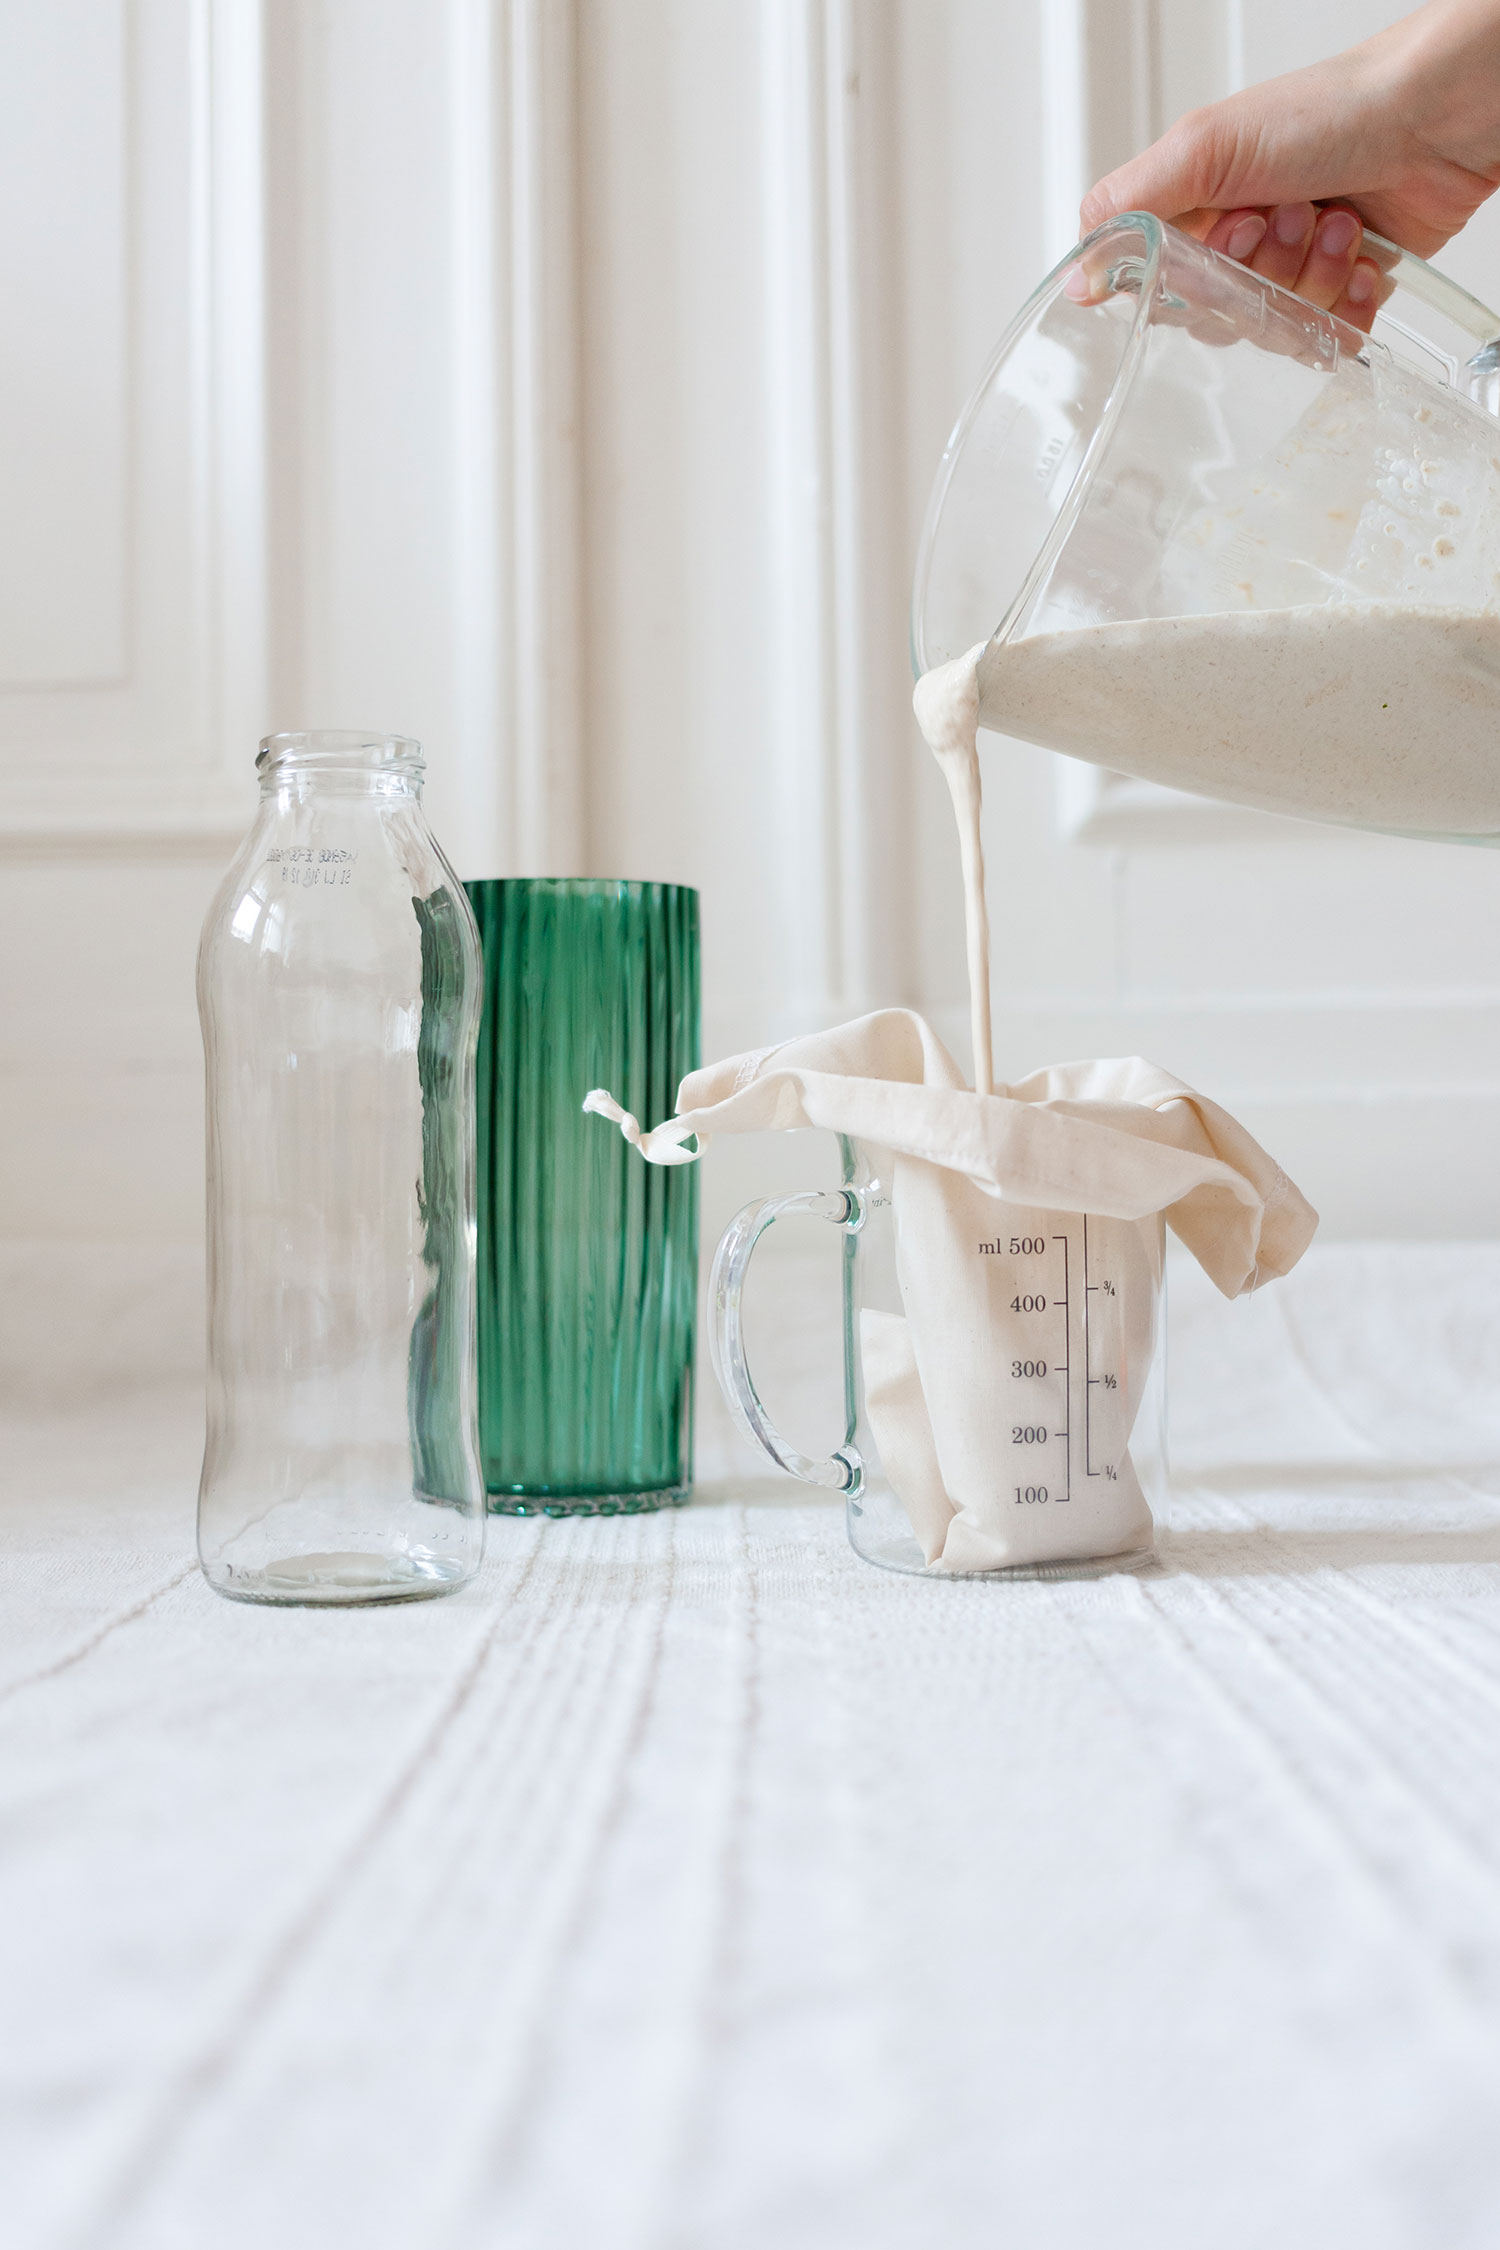 Zero Waste Pflanzenmilch Rezept - Plantmilk Recipe